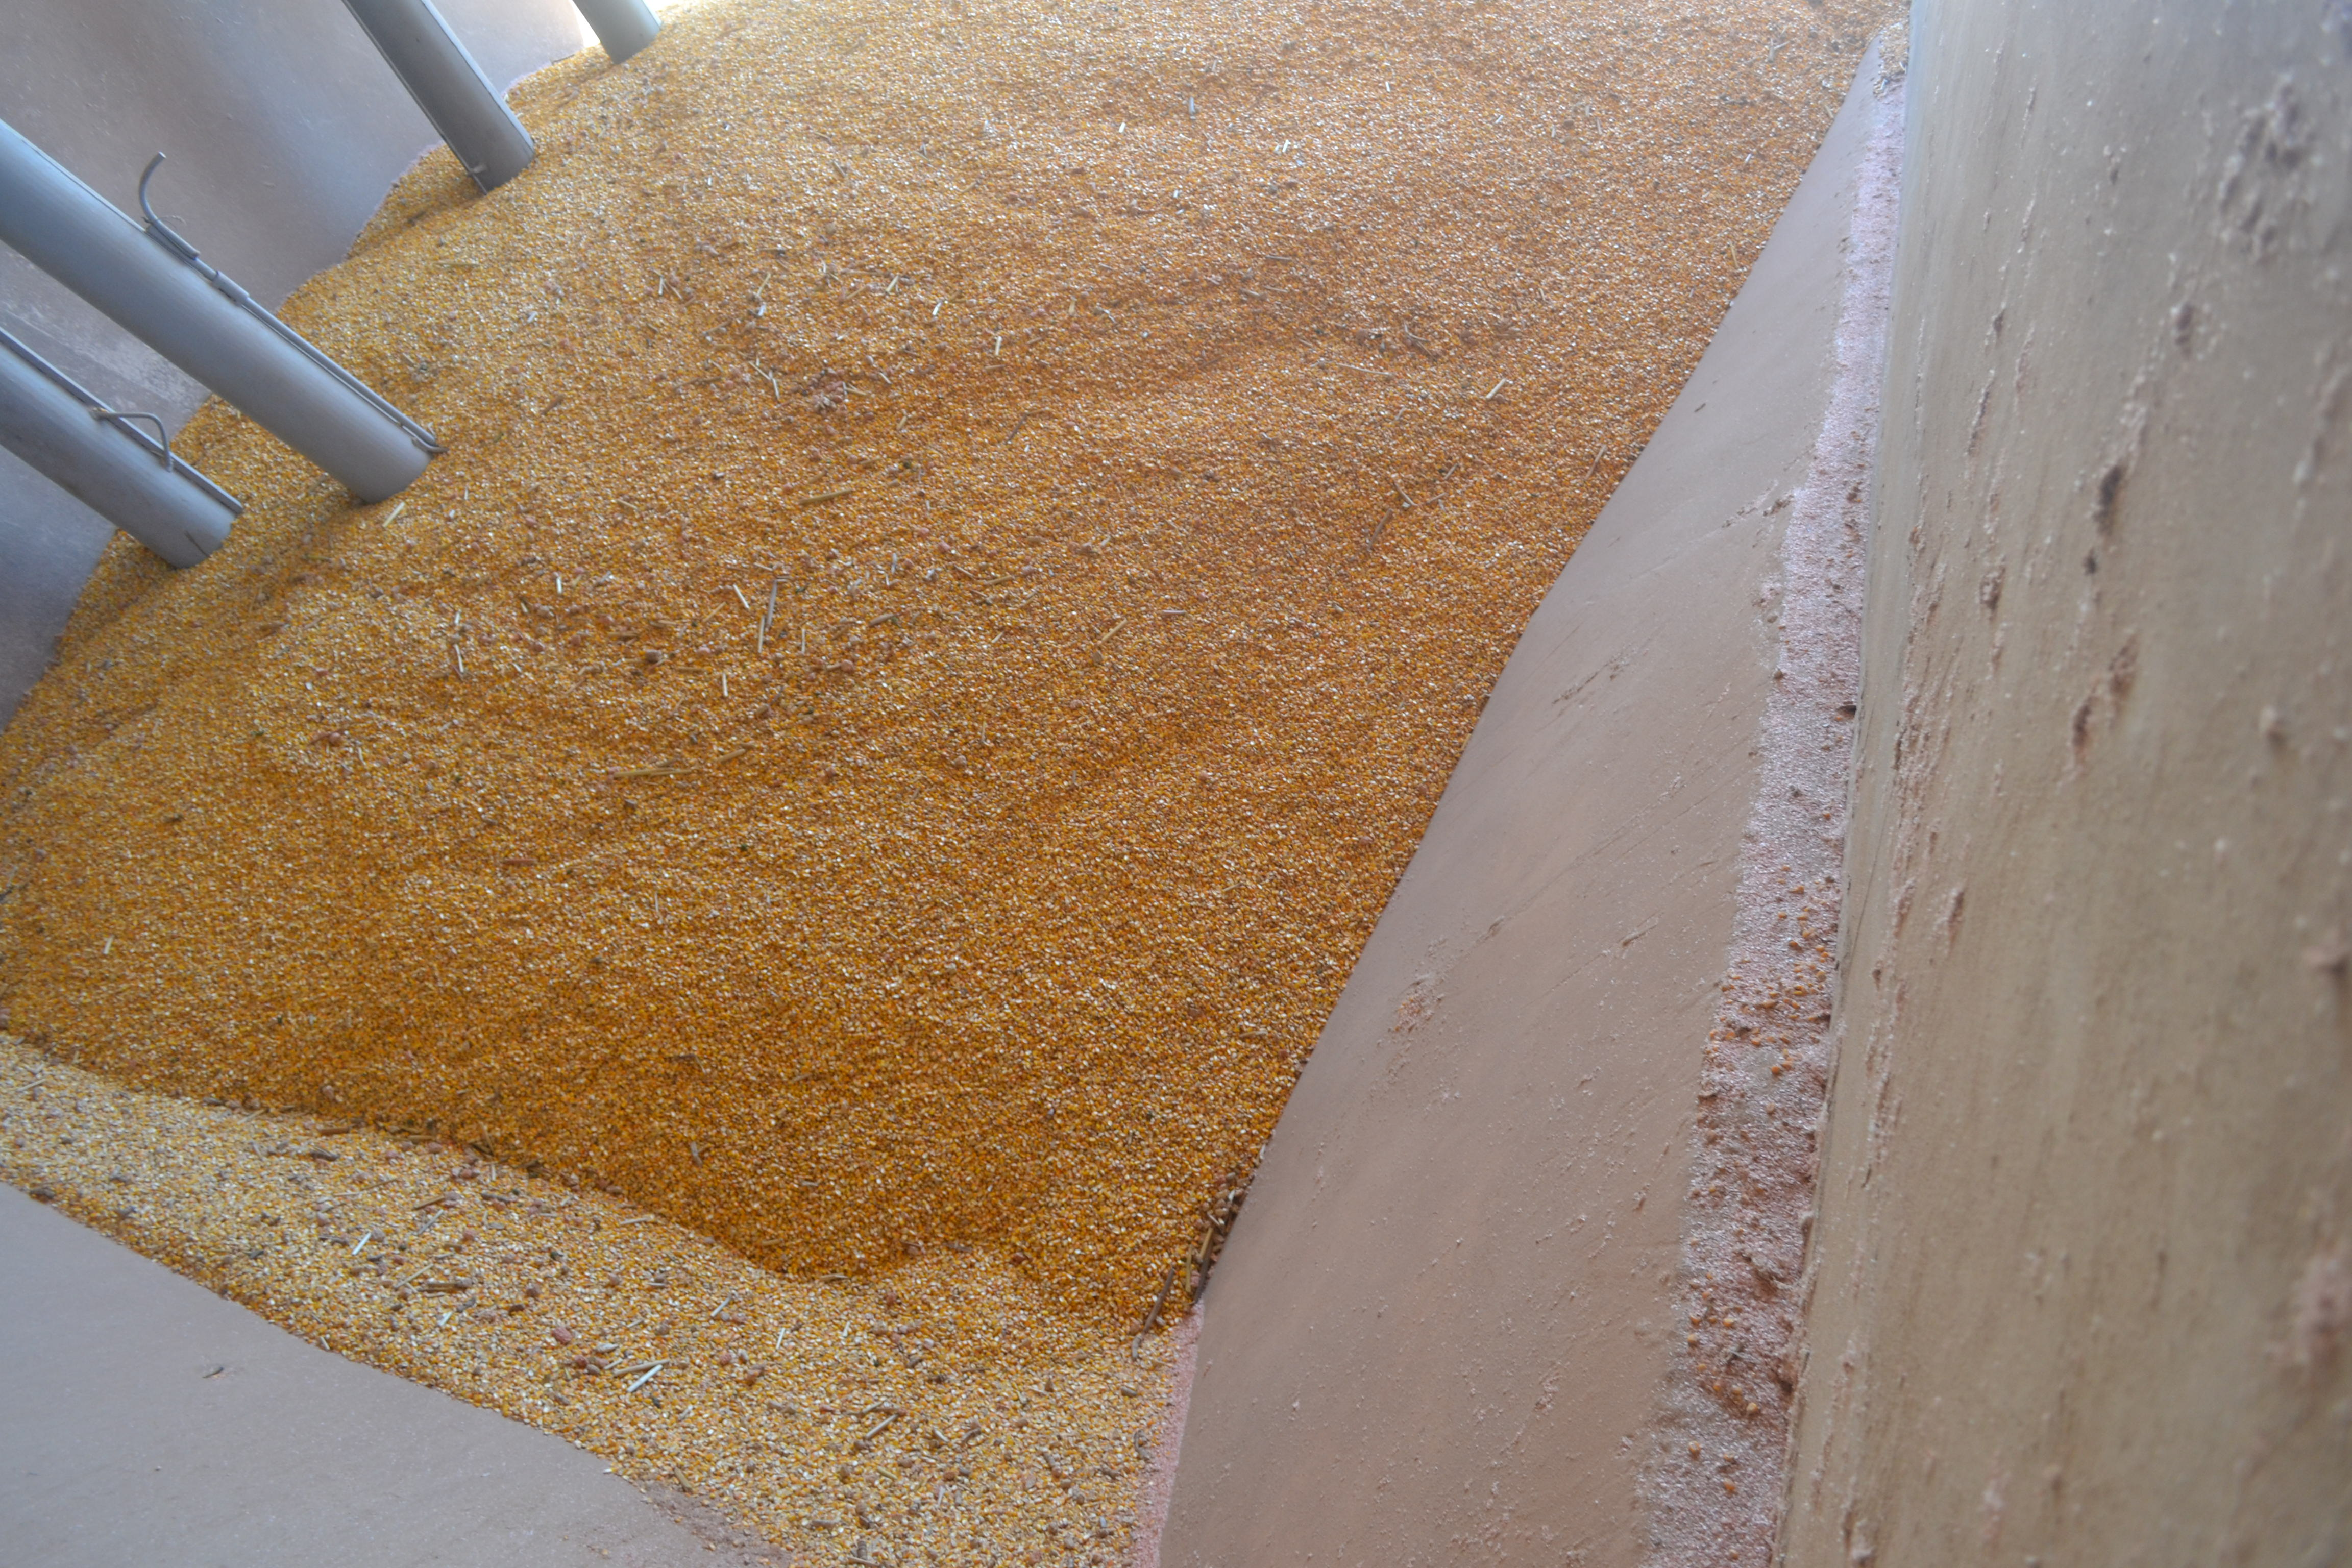 Corn in Mr. Paulo Franz's factory